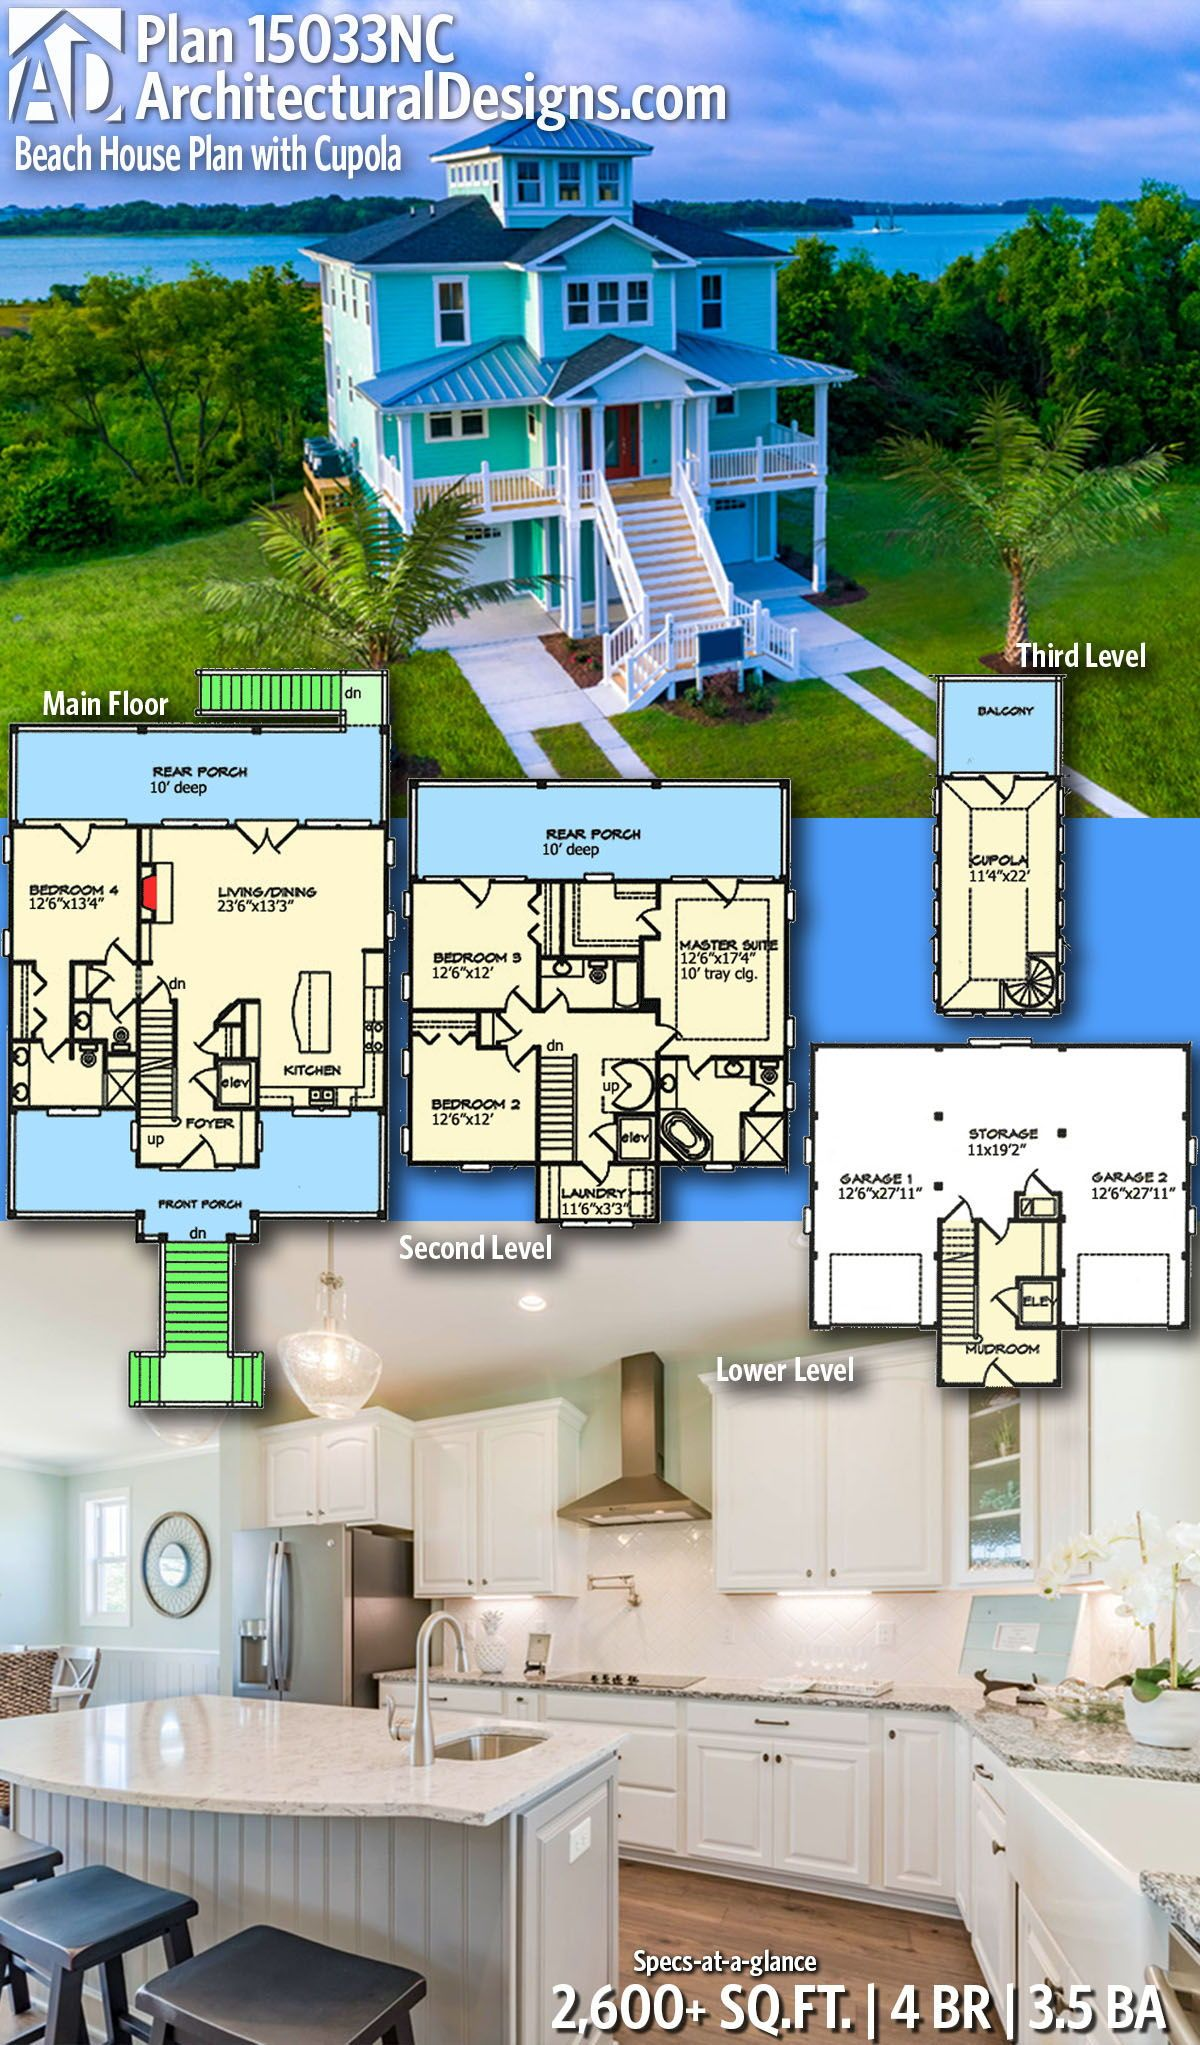 Plan 15033nc Beach House Plan With Cupola Beach House Floor Plans Beach House Plan Beach House Flooring